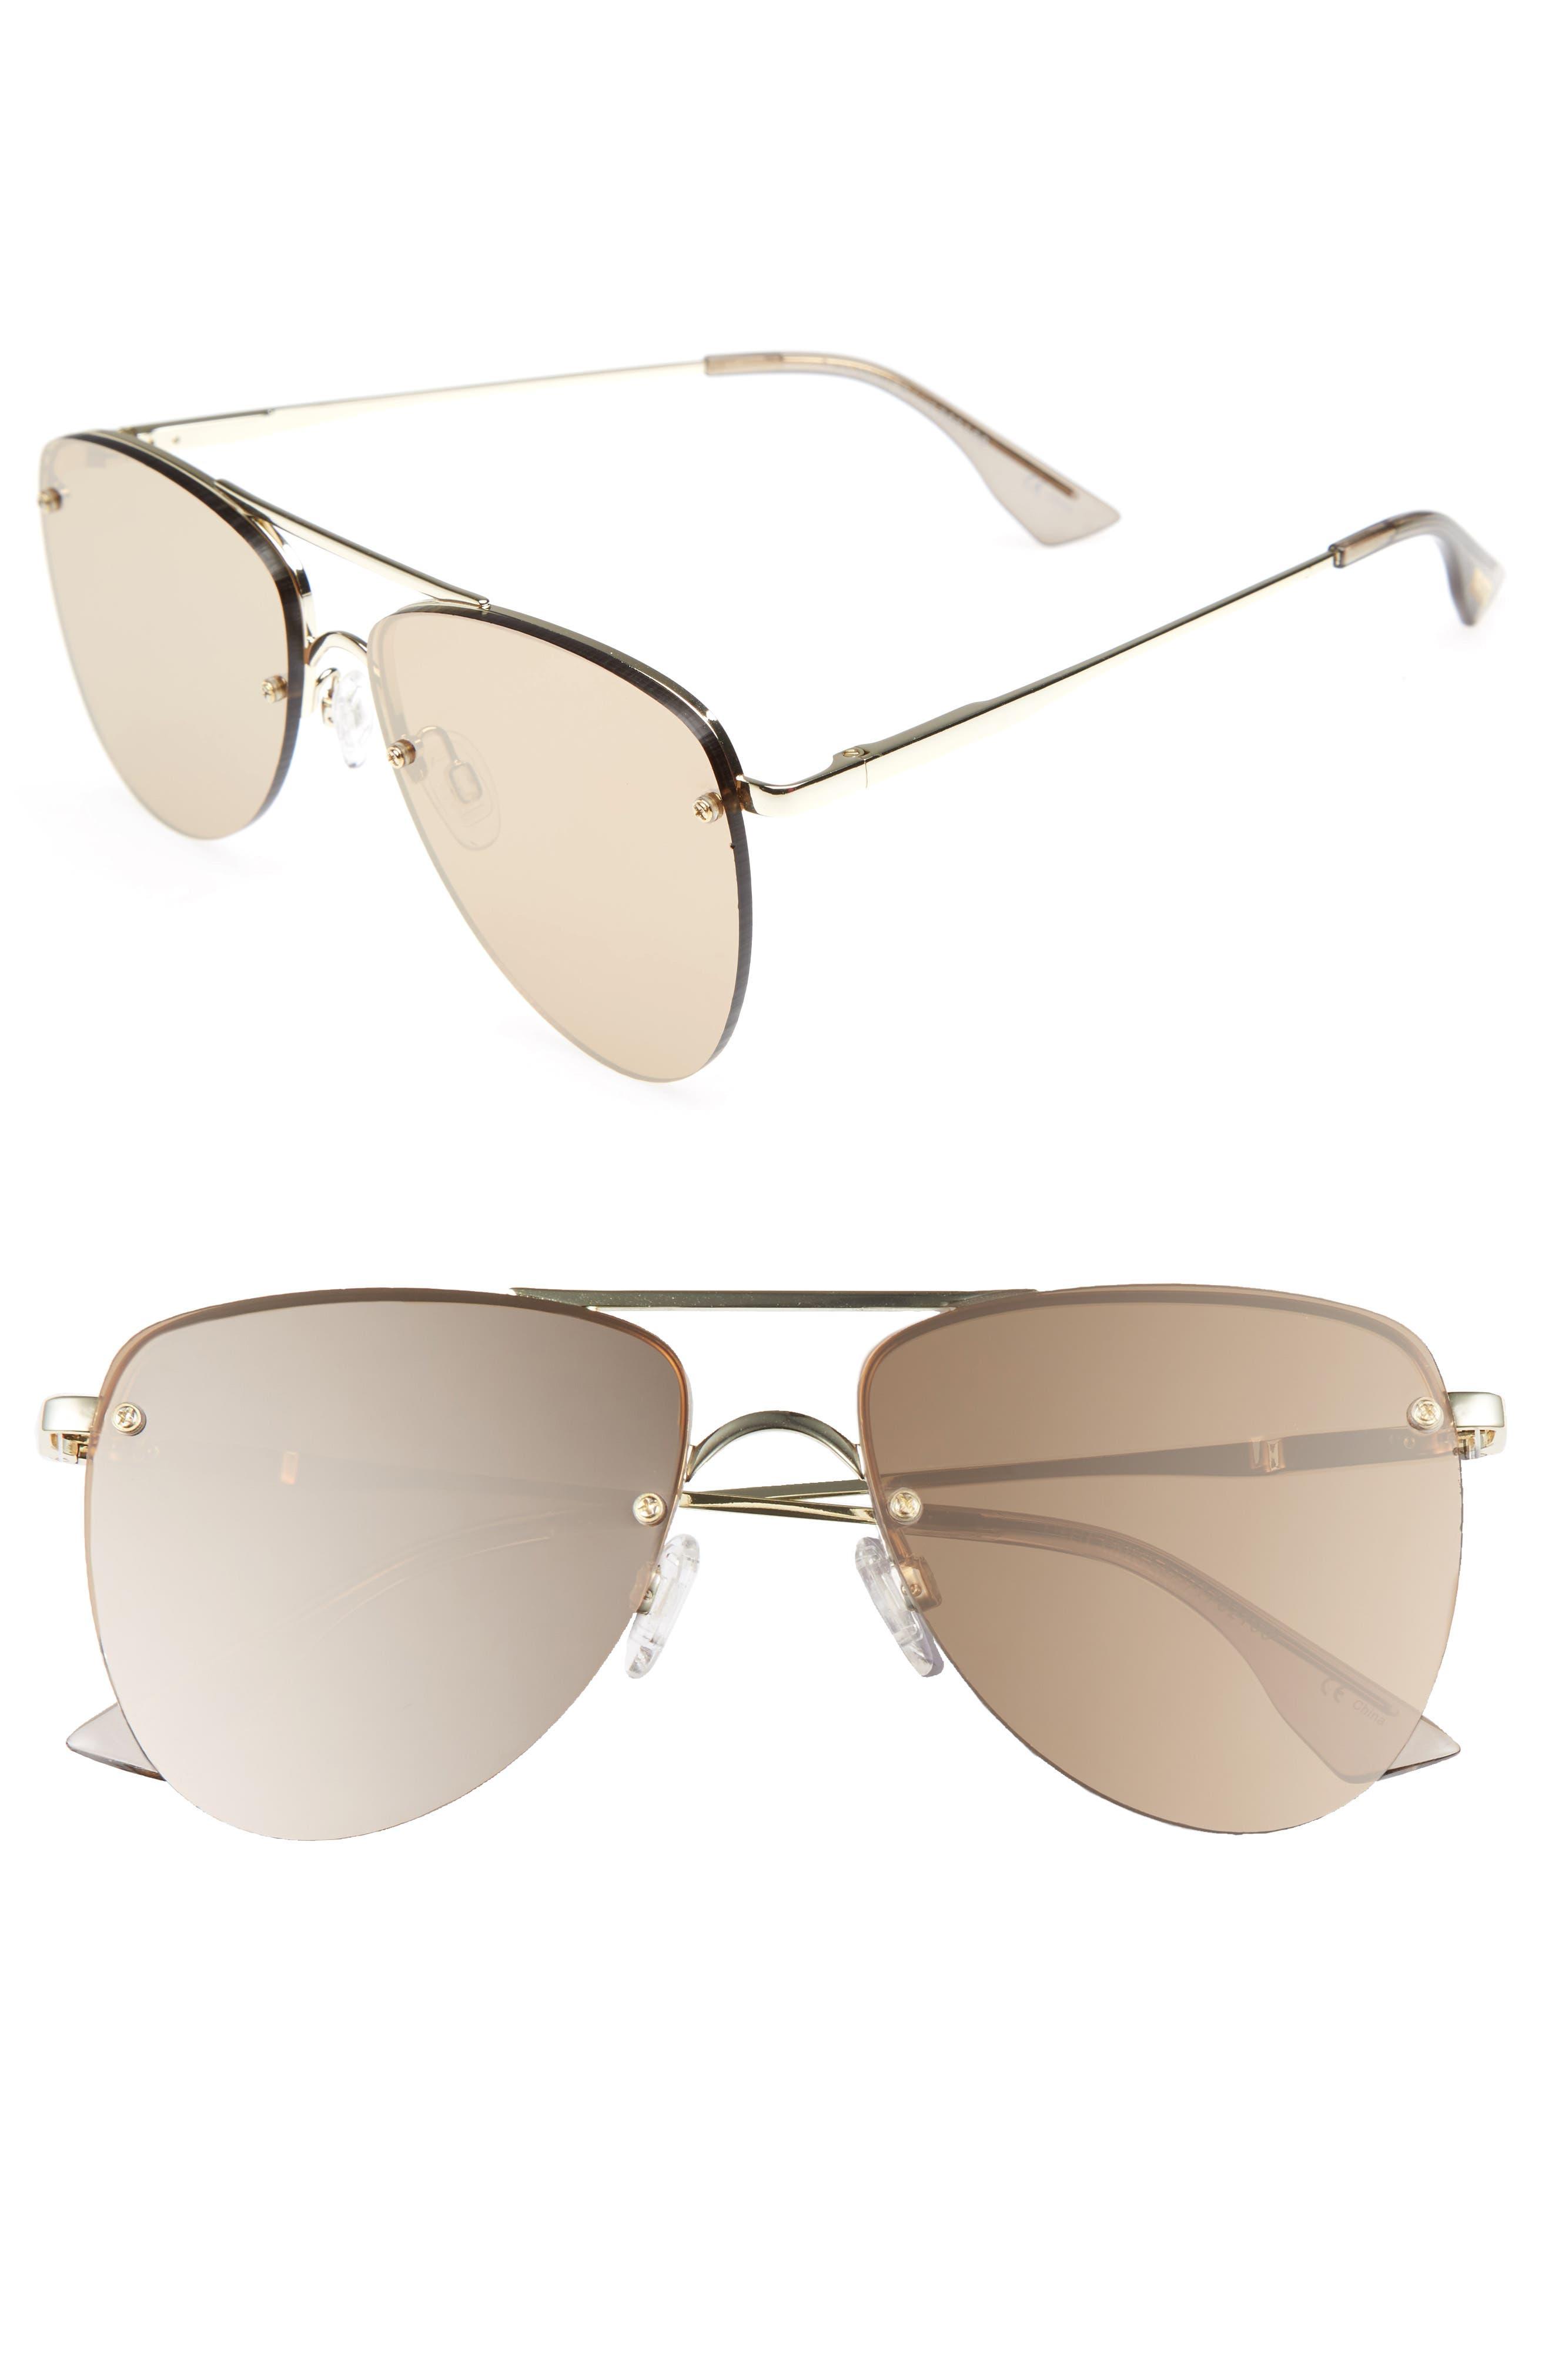 The Prince 59mm Mirrored Rimless Aviator Sunglasses,                             Main thumbnail 1, color,                             710